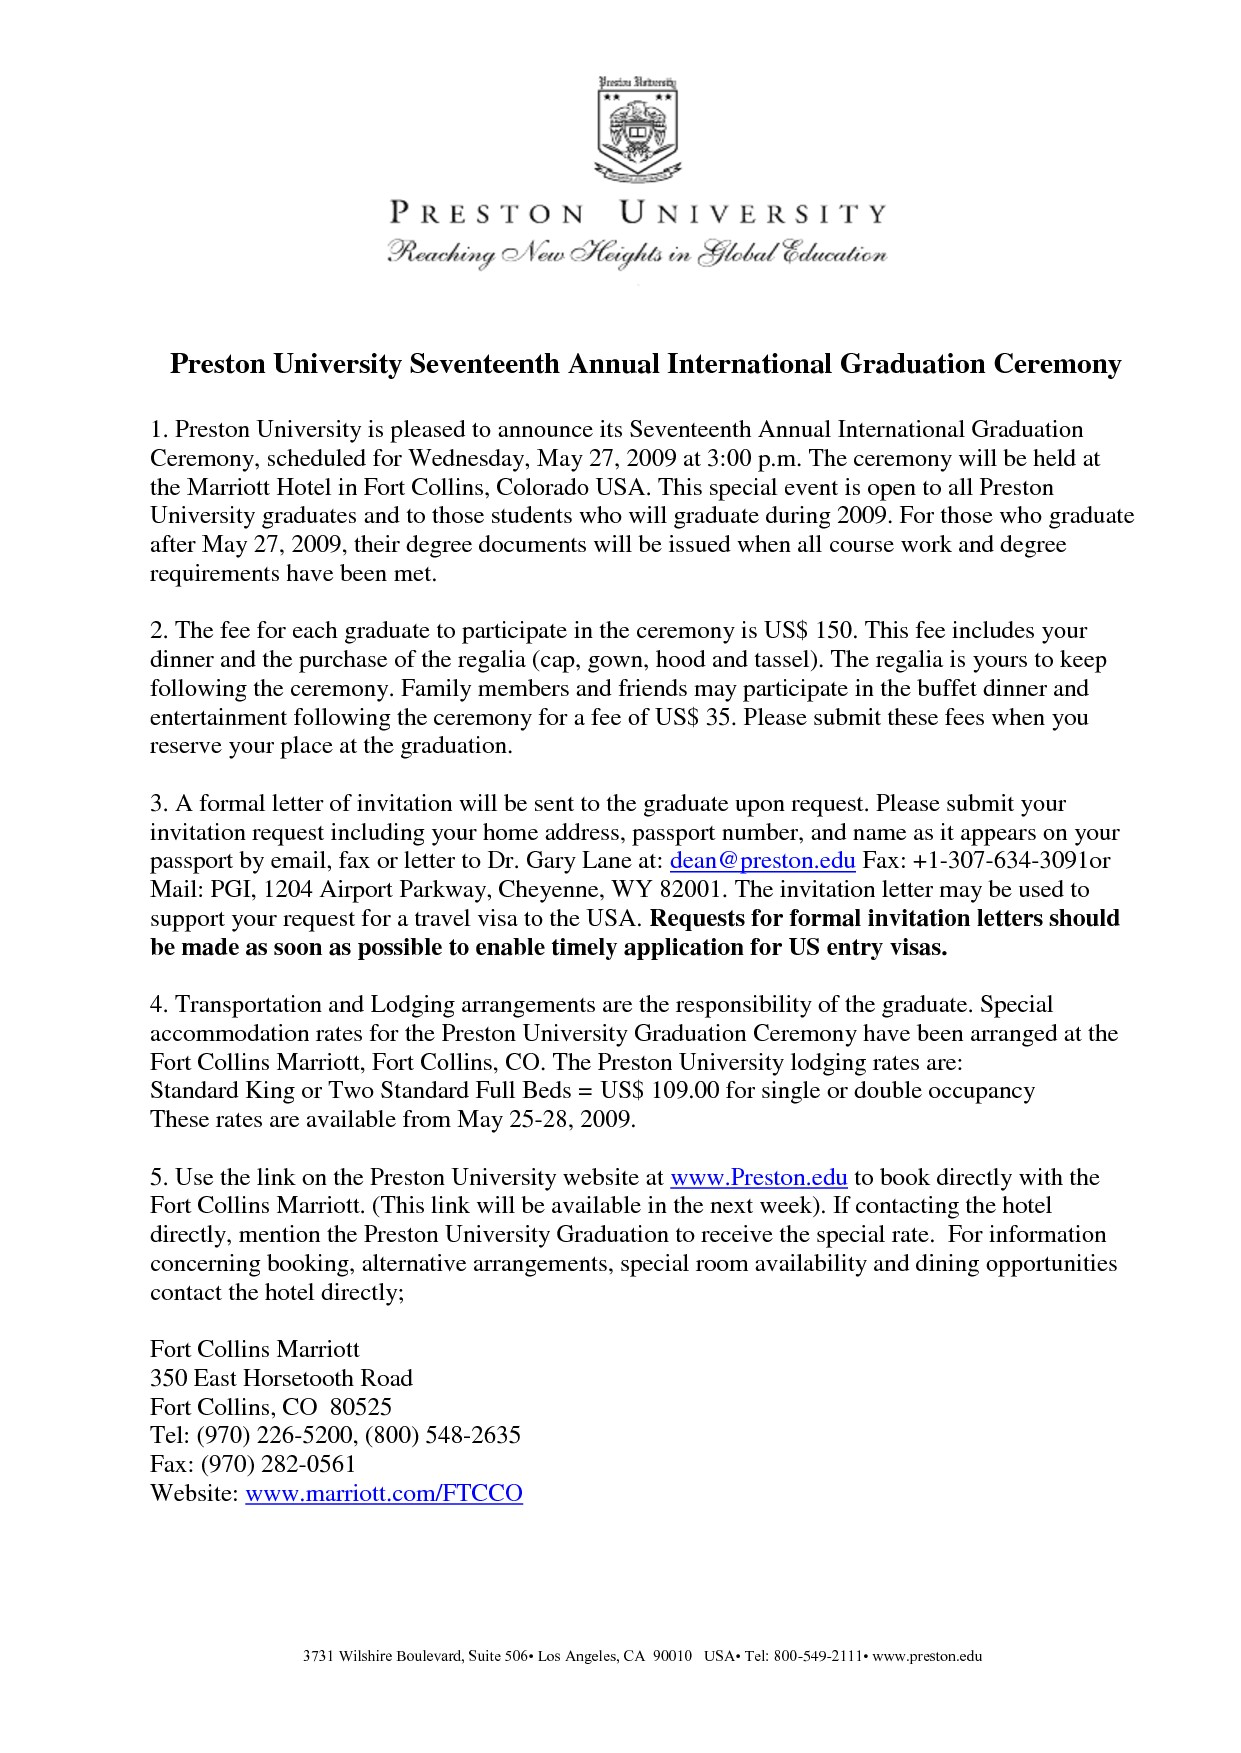 Graduation Invitation Letter for Parents Graduation Invitation Examples